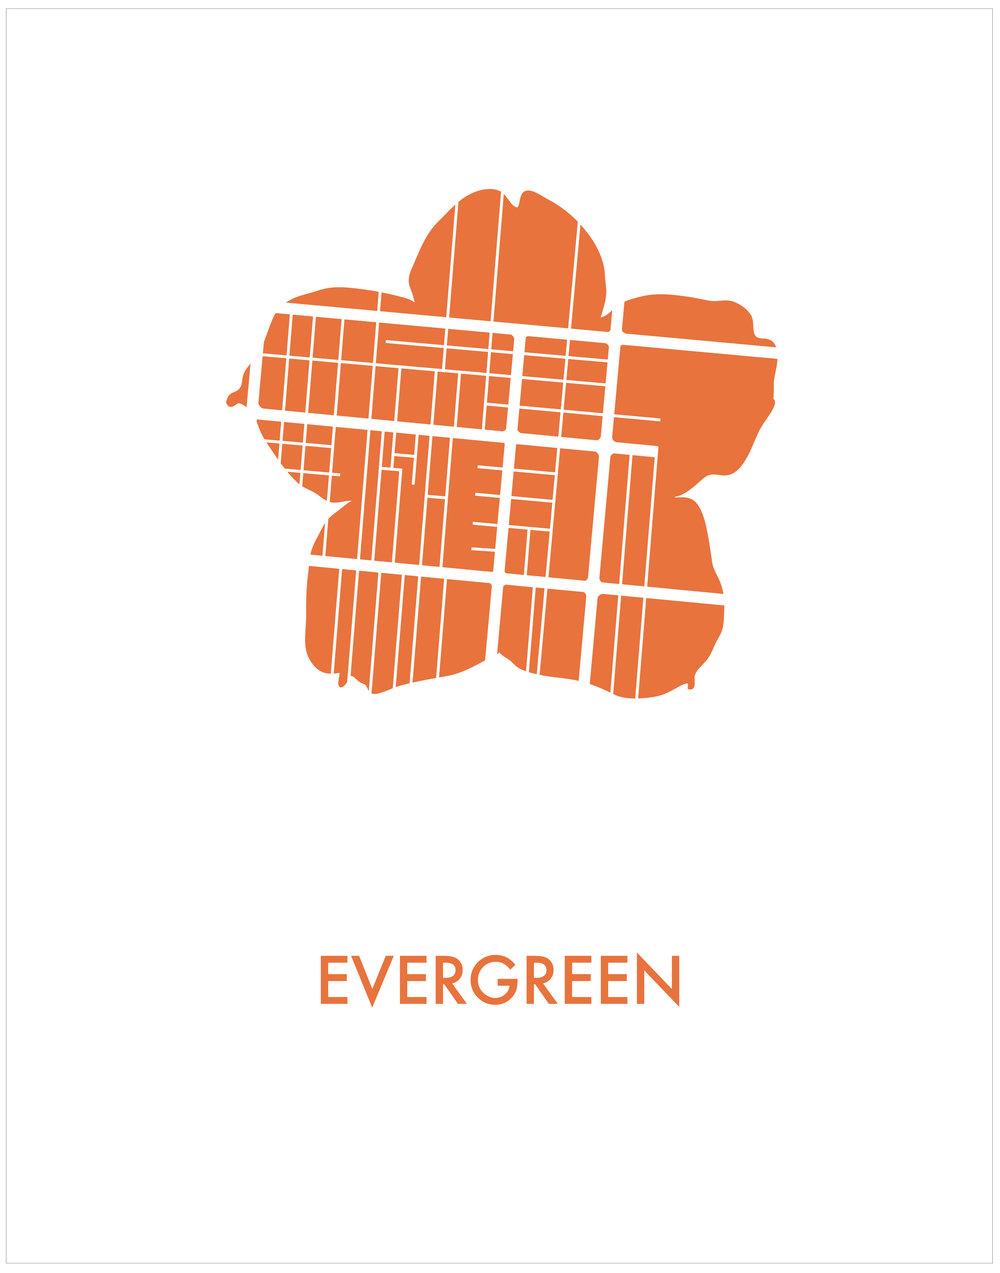 evergreen2 no type.jpg